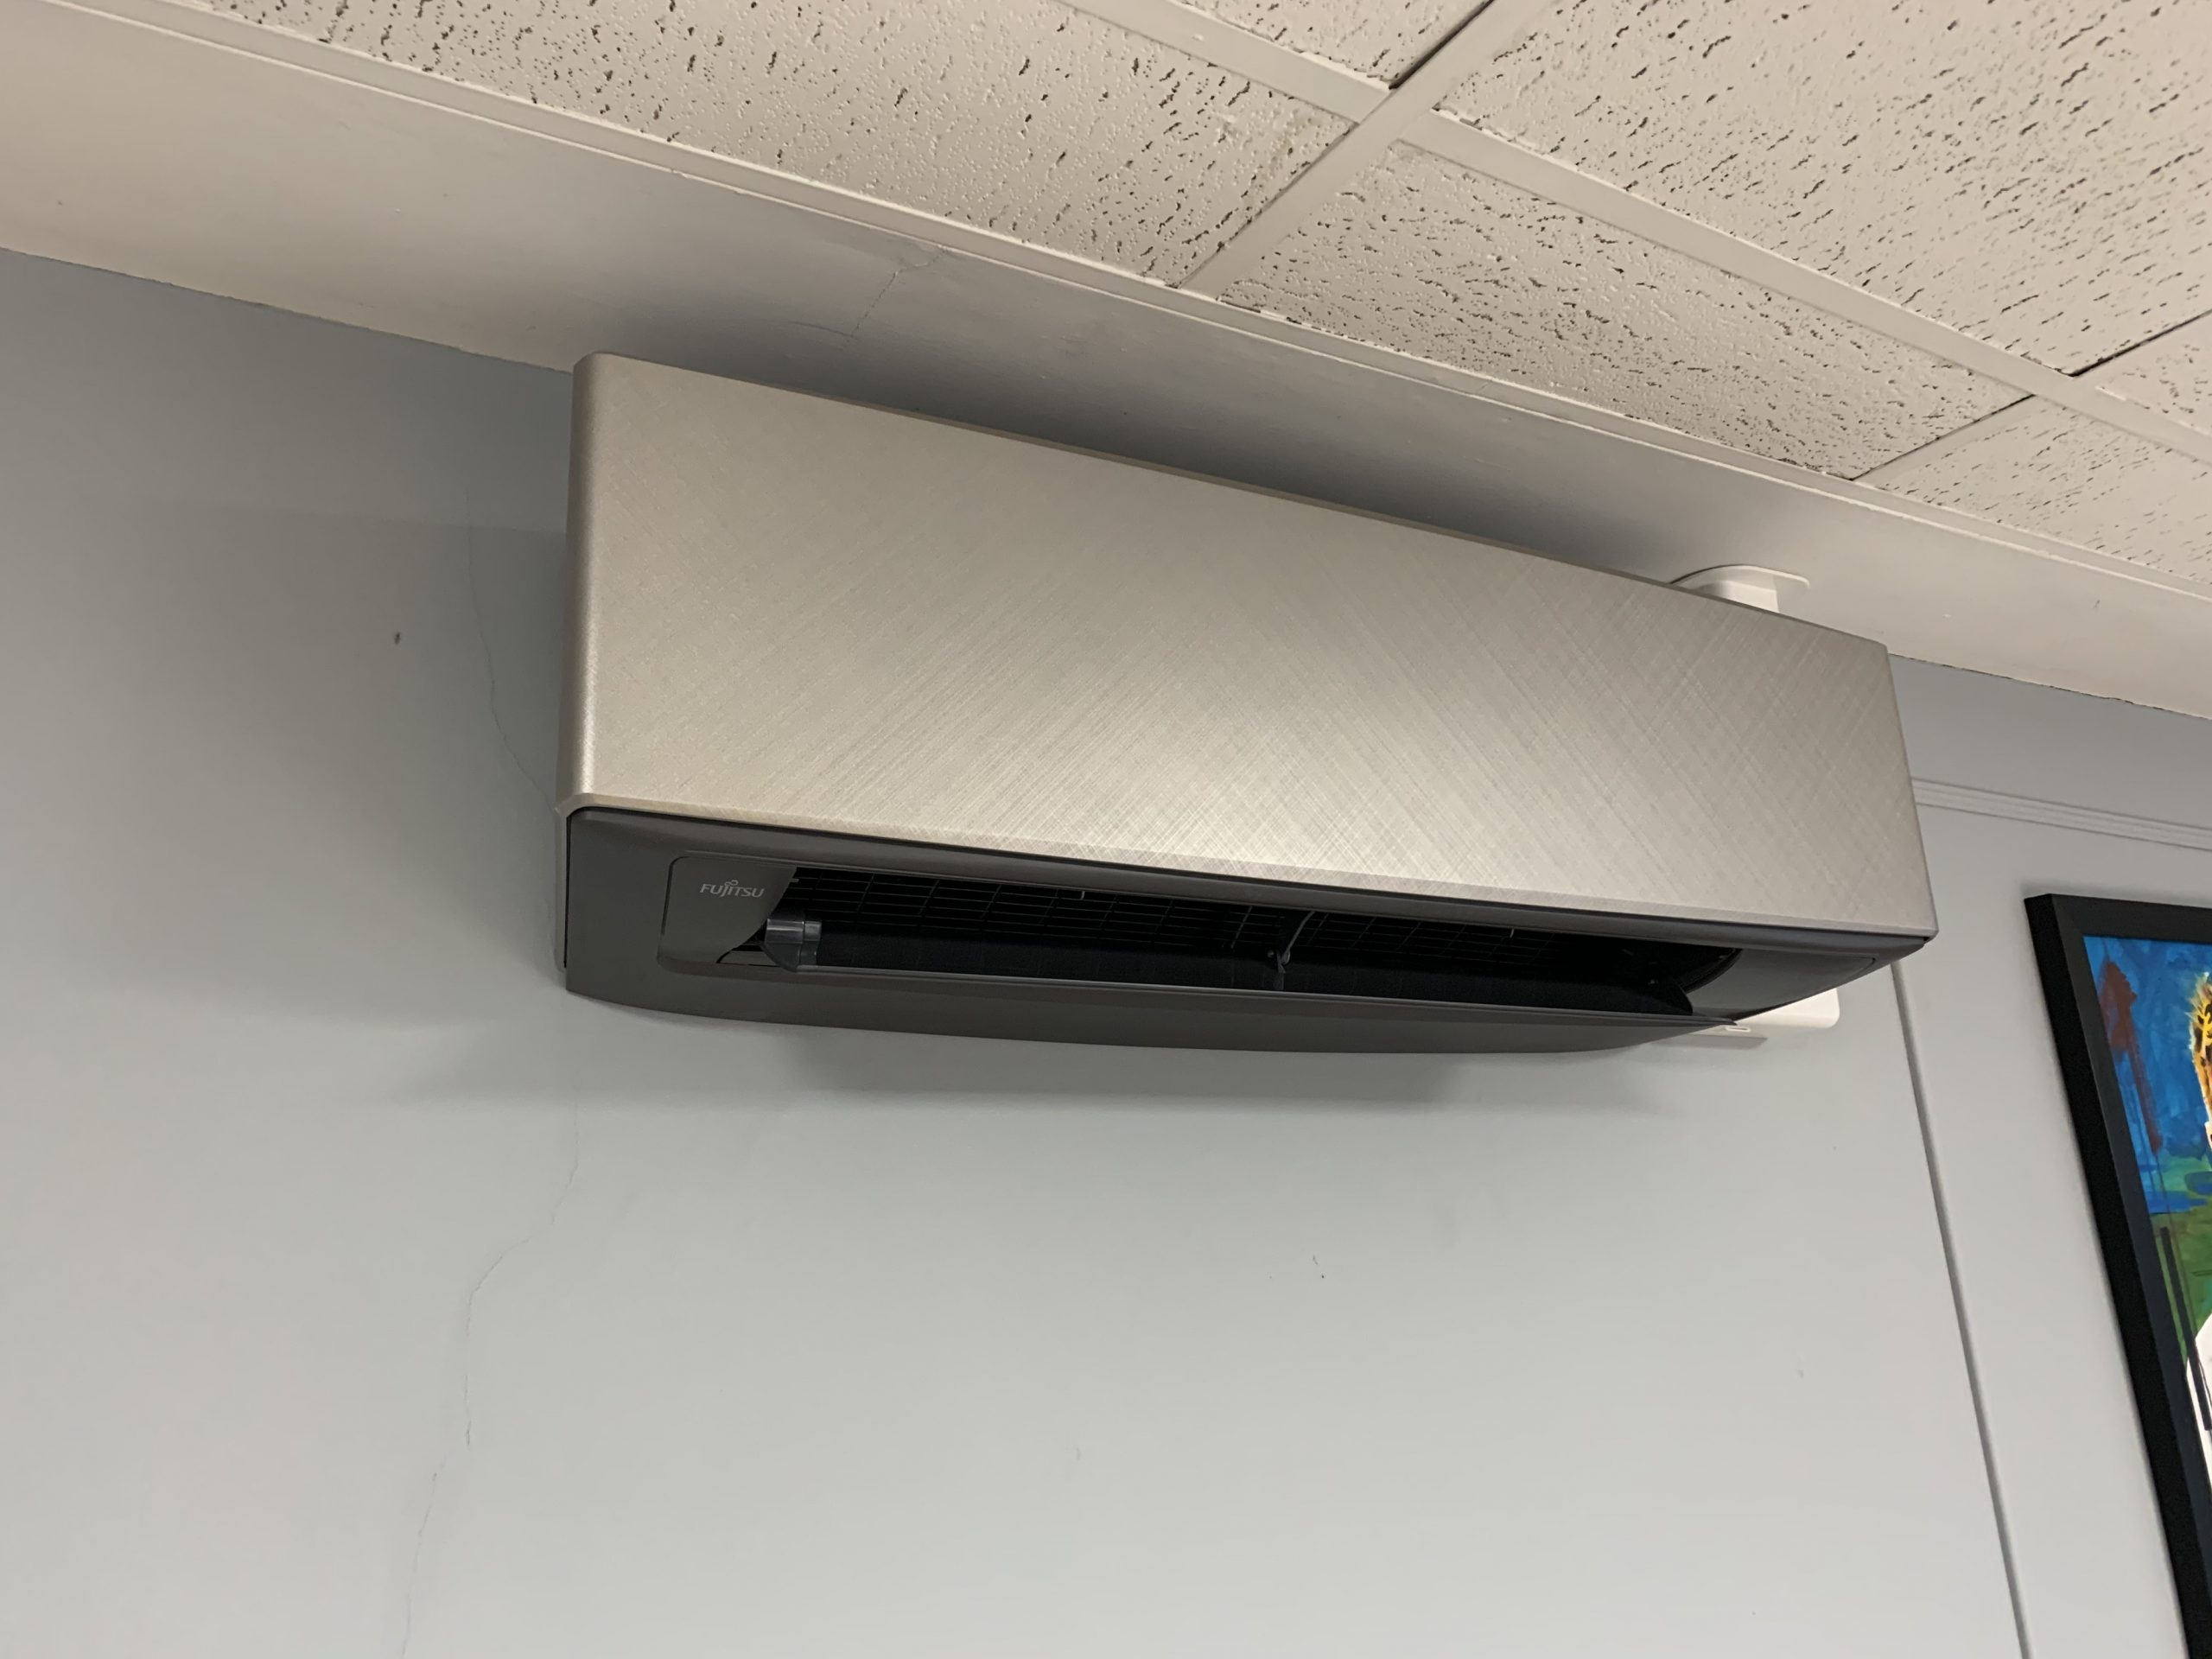 Silver Fujitsu wall mount